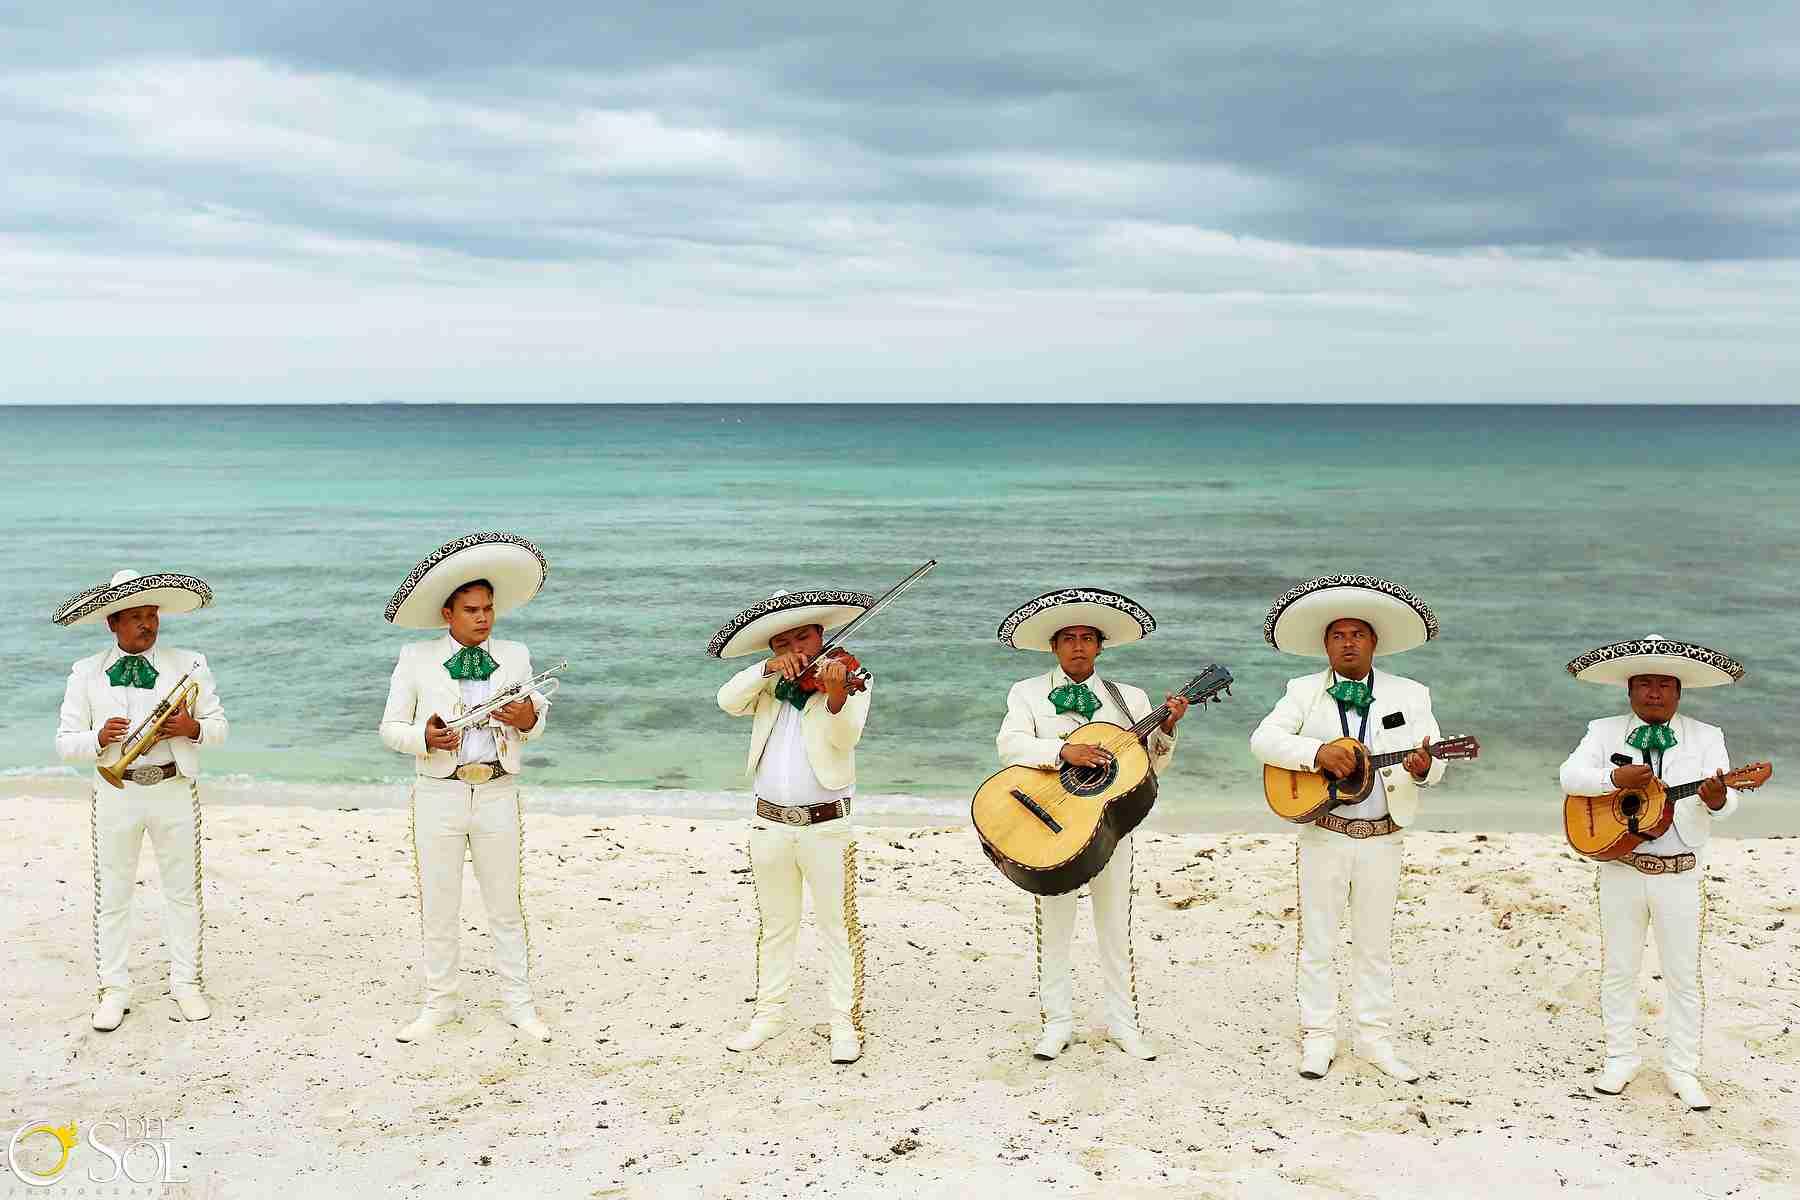 Brooke and Stephen , Beach Wedding at Blue Venado Beach Club, Playa del Carmen, Mexico. Photos bt Del Sol Photography.